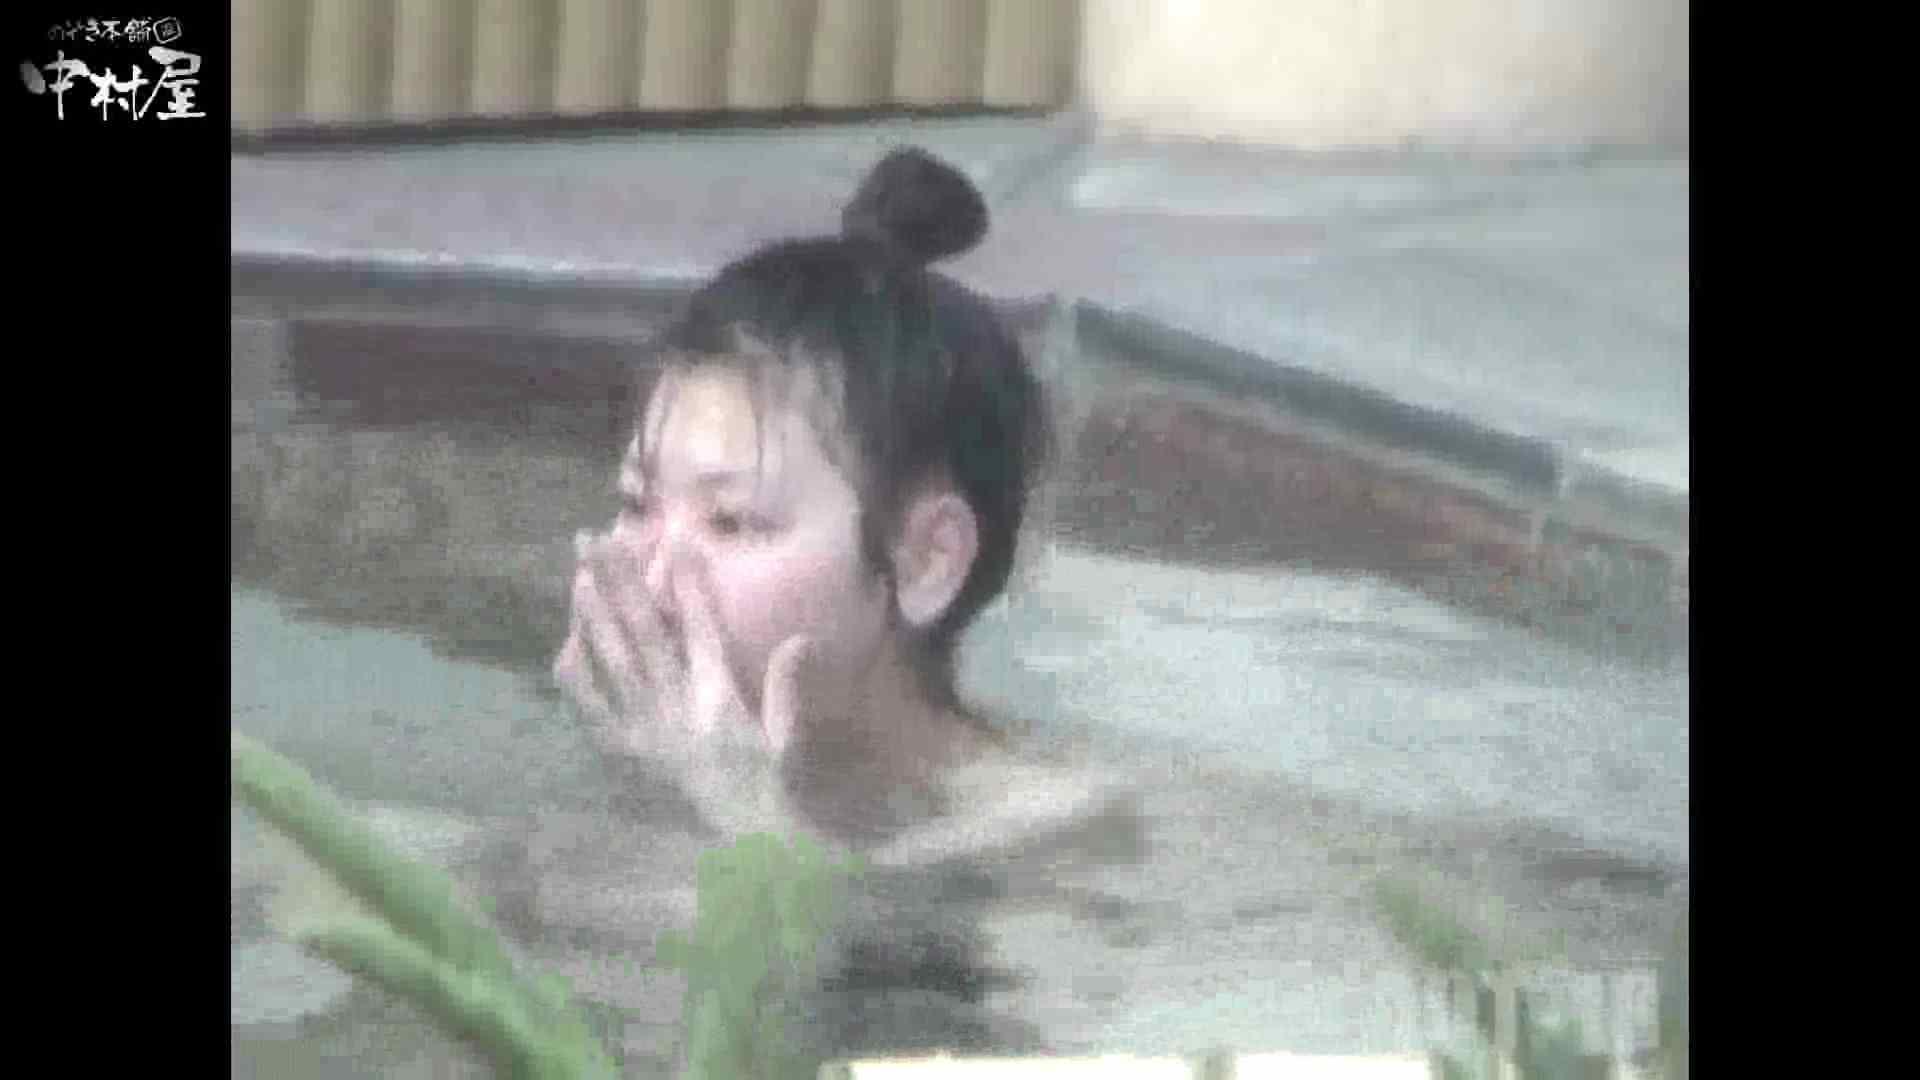 Aquaな露天風呂Vol.882潜入盗撮露天風呂十八判湯 其の二 OLエロ画像 覗きスケベ動画紹介 78PICs 34